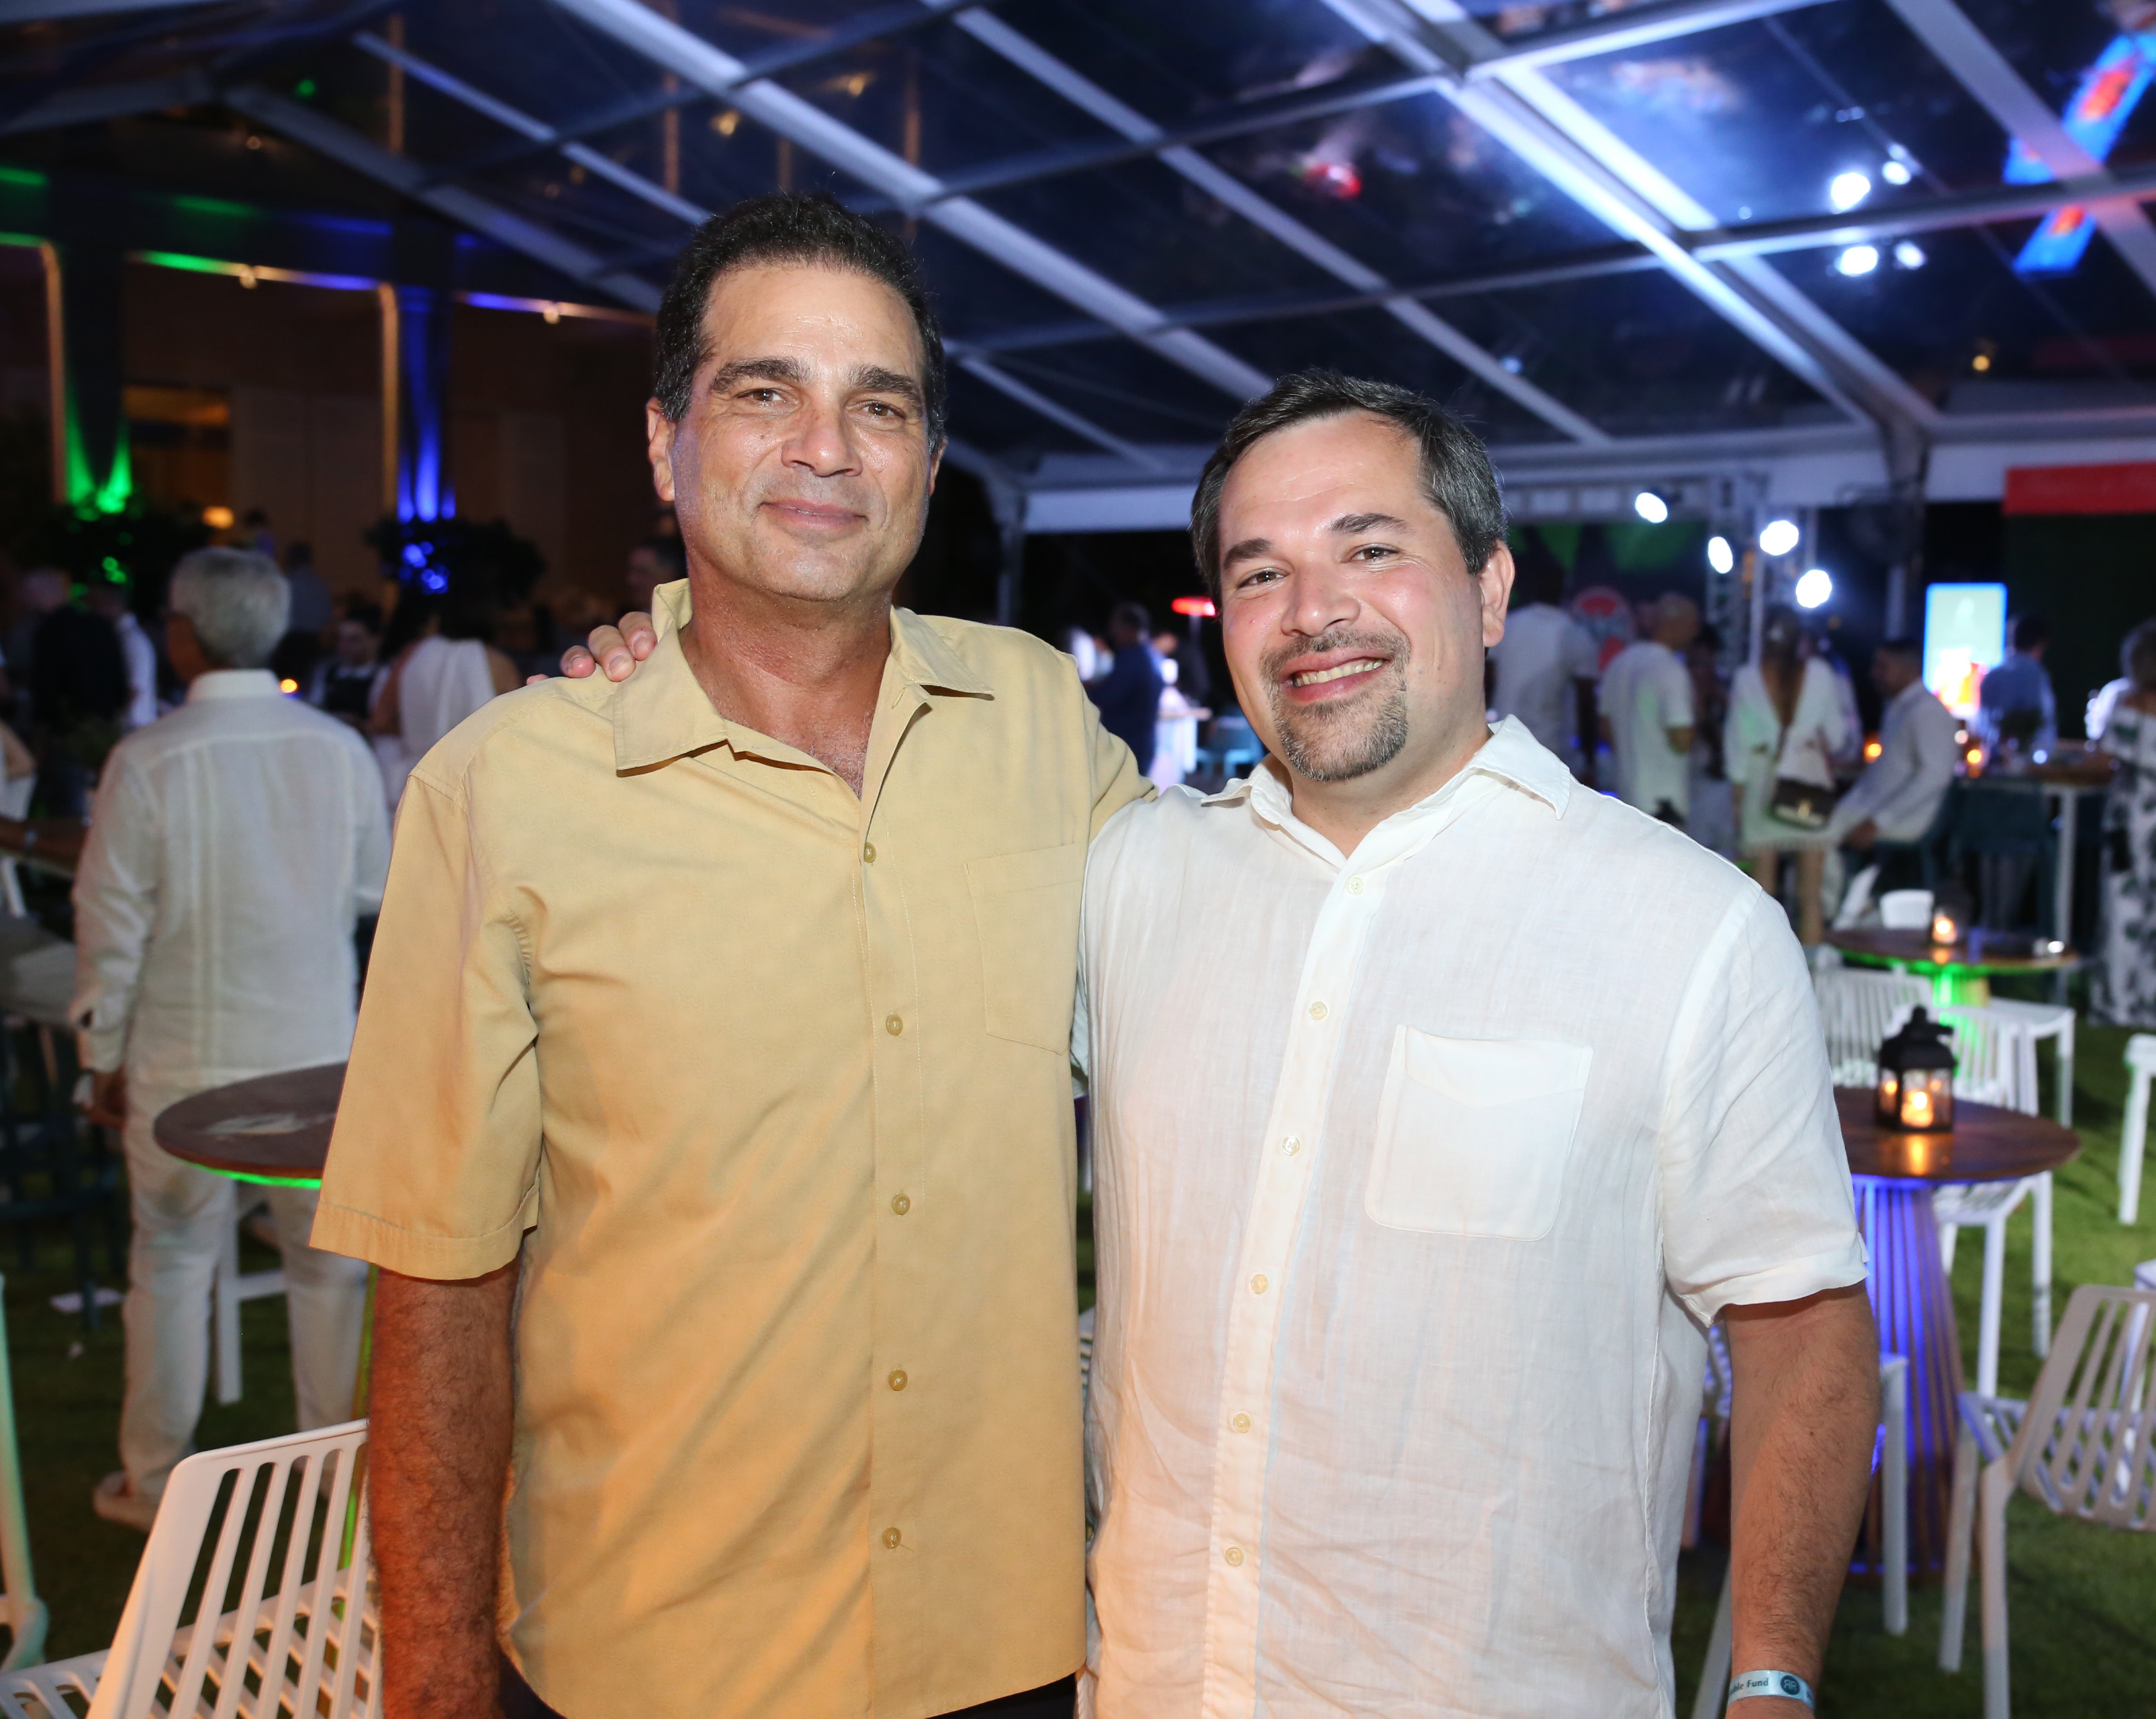 Carlos Nido e invitado. (José R. Pérez Centeno)